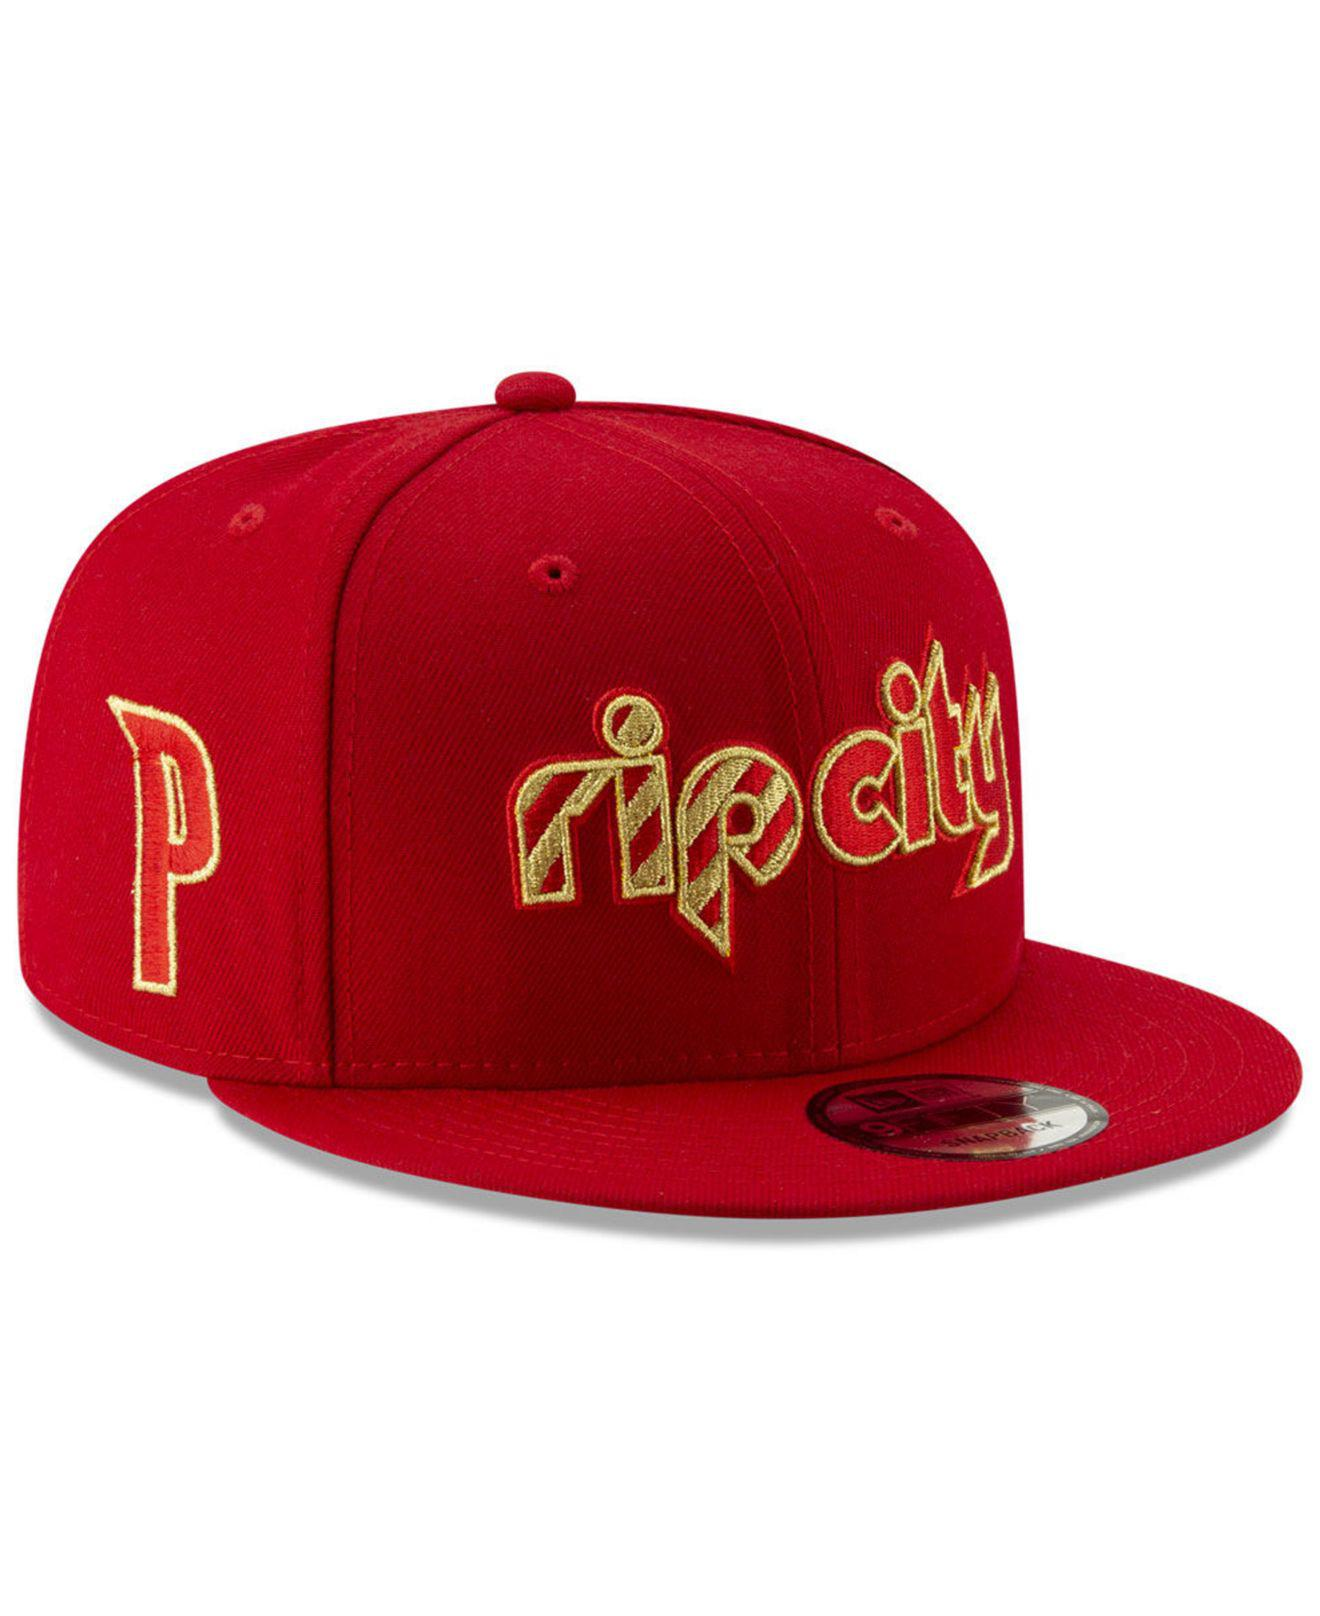 new product da4c5 db727 KTZ. Men s Red Portland Trail Blazers Mishmash 9fifty Snapback Cap